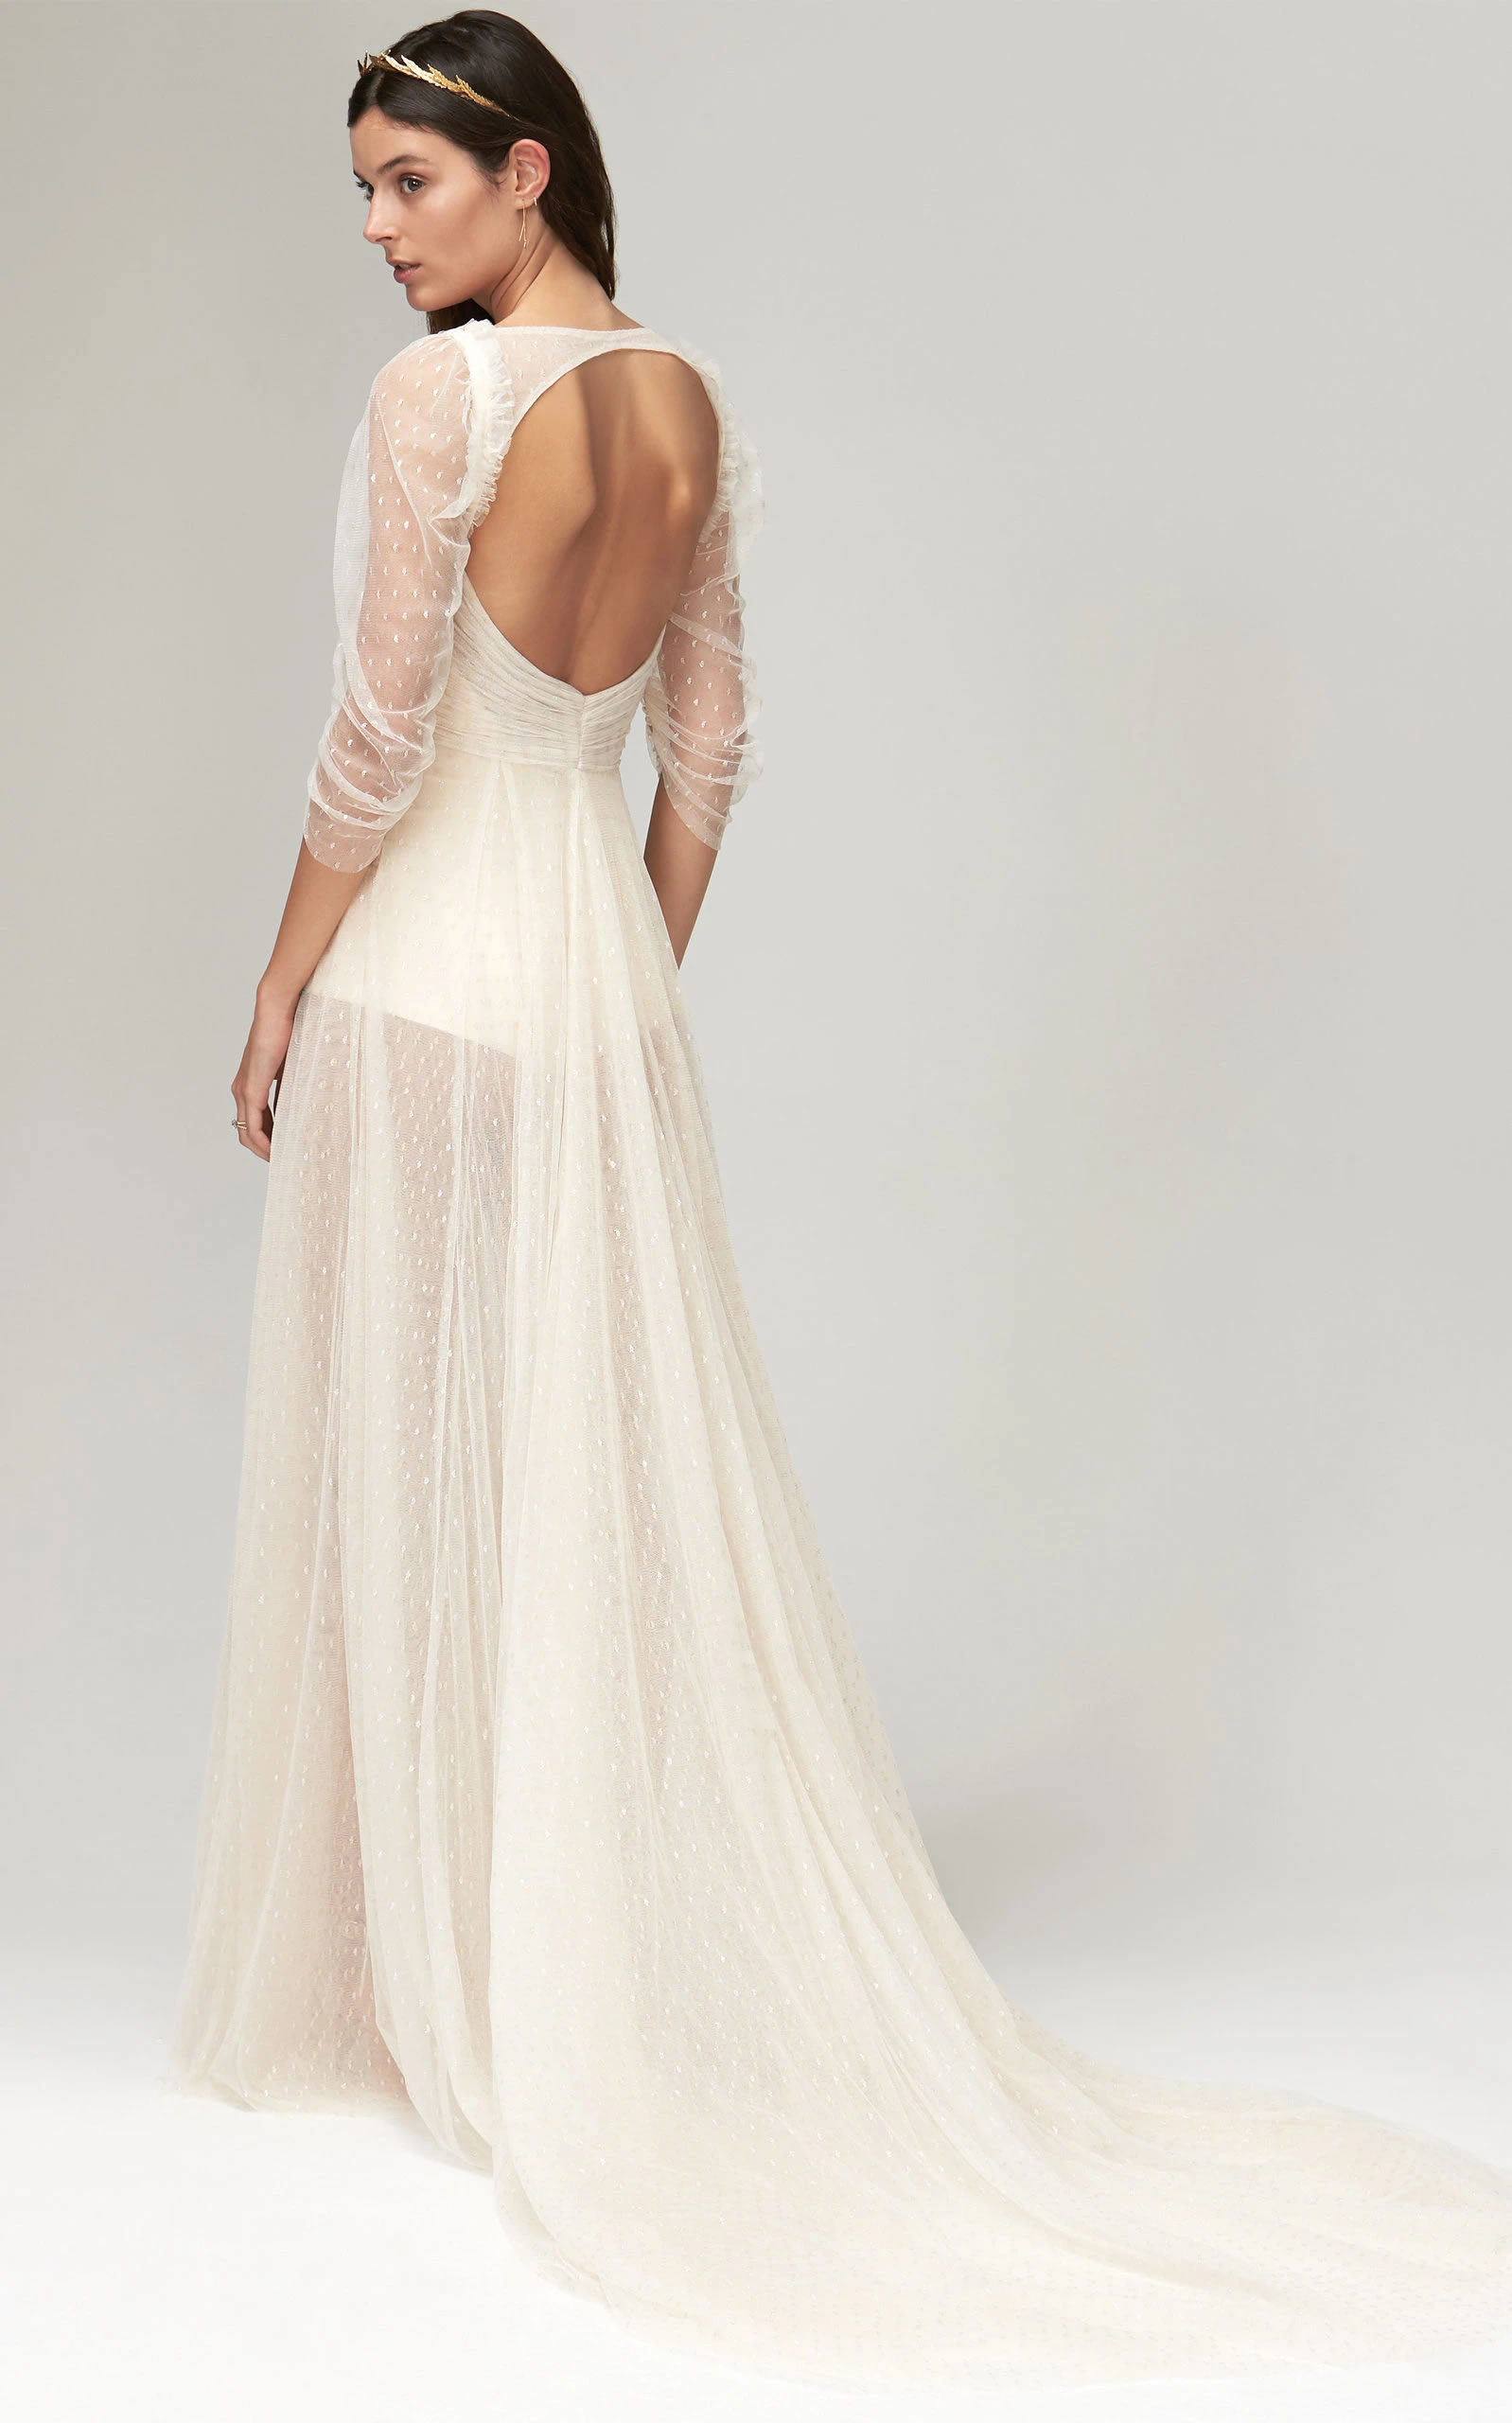 Savannah Miller - Clara Metallic Spot Tulle Gown With Transparent Puff Sleeve